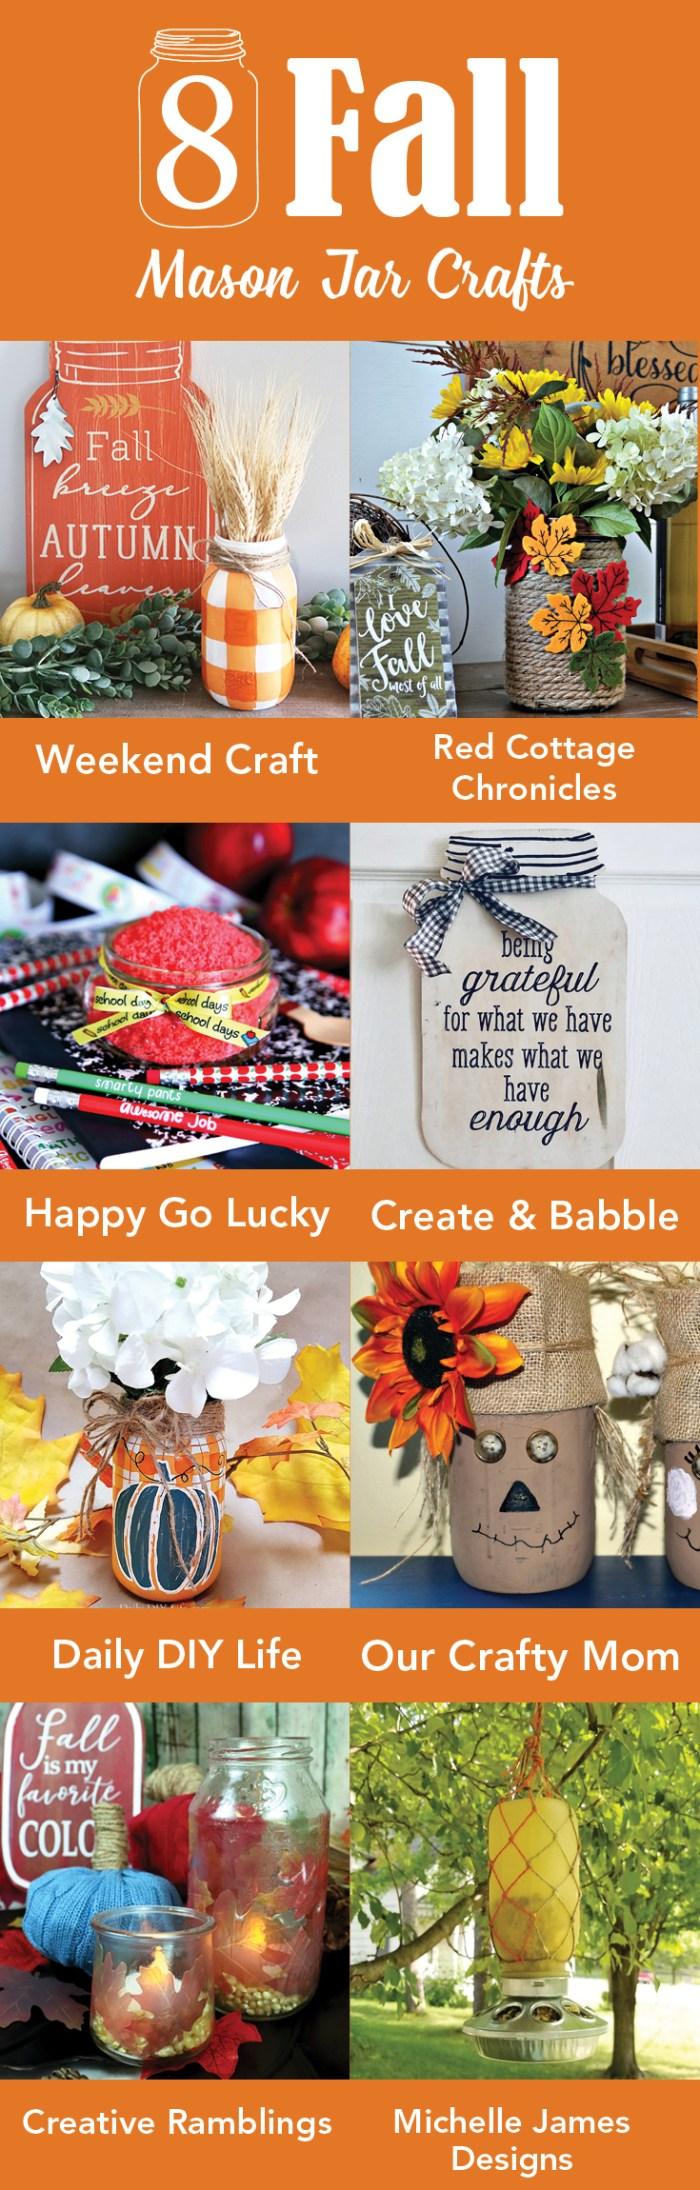 8 Fall Mason Jar Craft Ideas